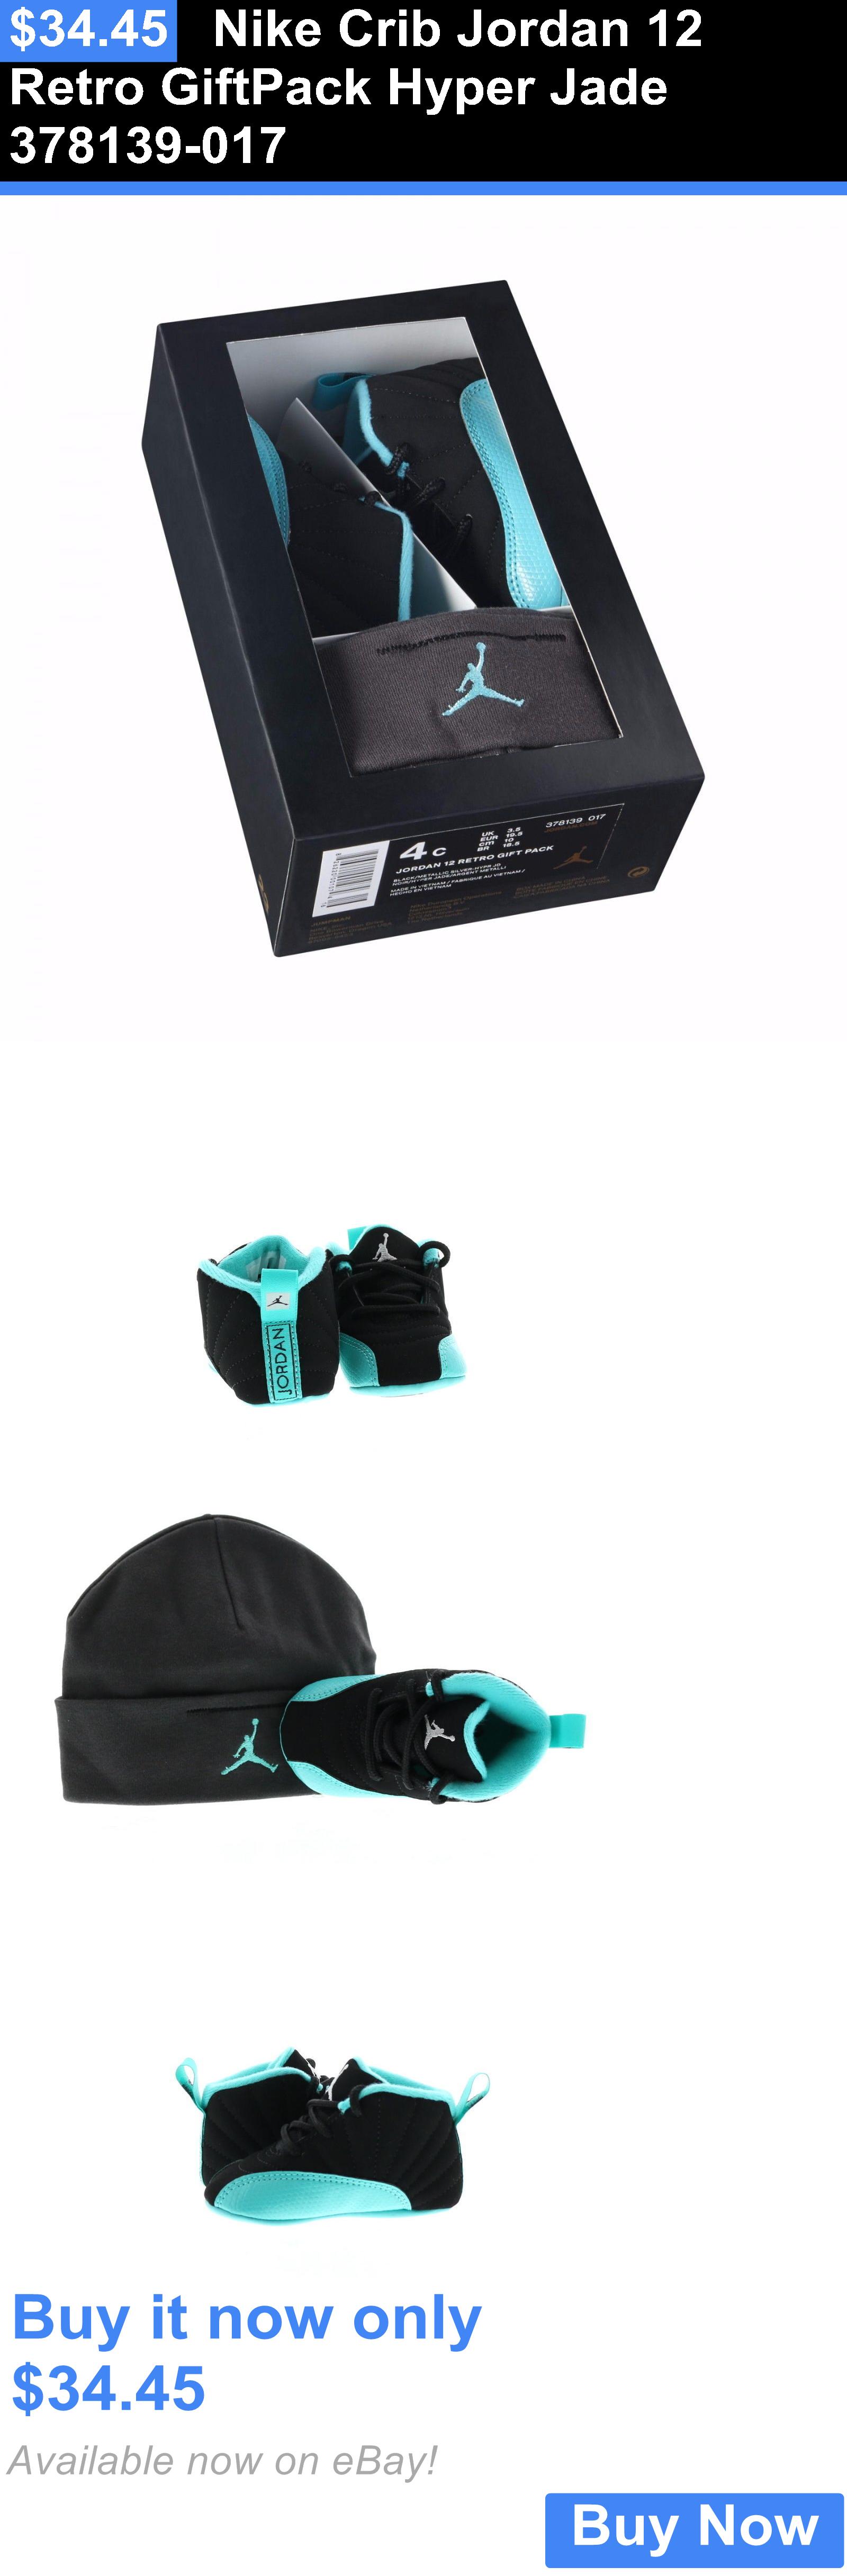 5d148534331f2 Infant Shoes  Nike Crib Jordan 12 Retro Giftpack Hyper Jade 378139-017 BUY  IT NOW ONLY   34.45